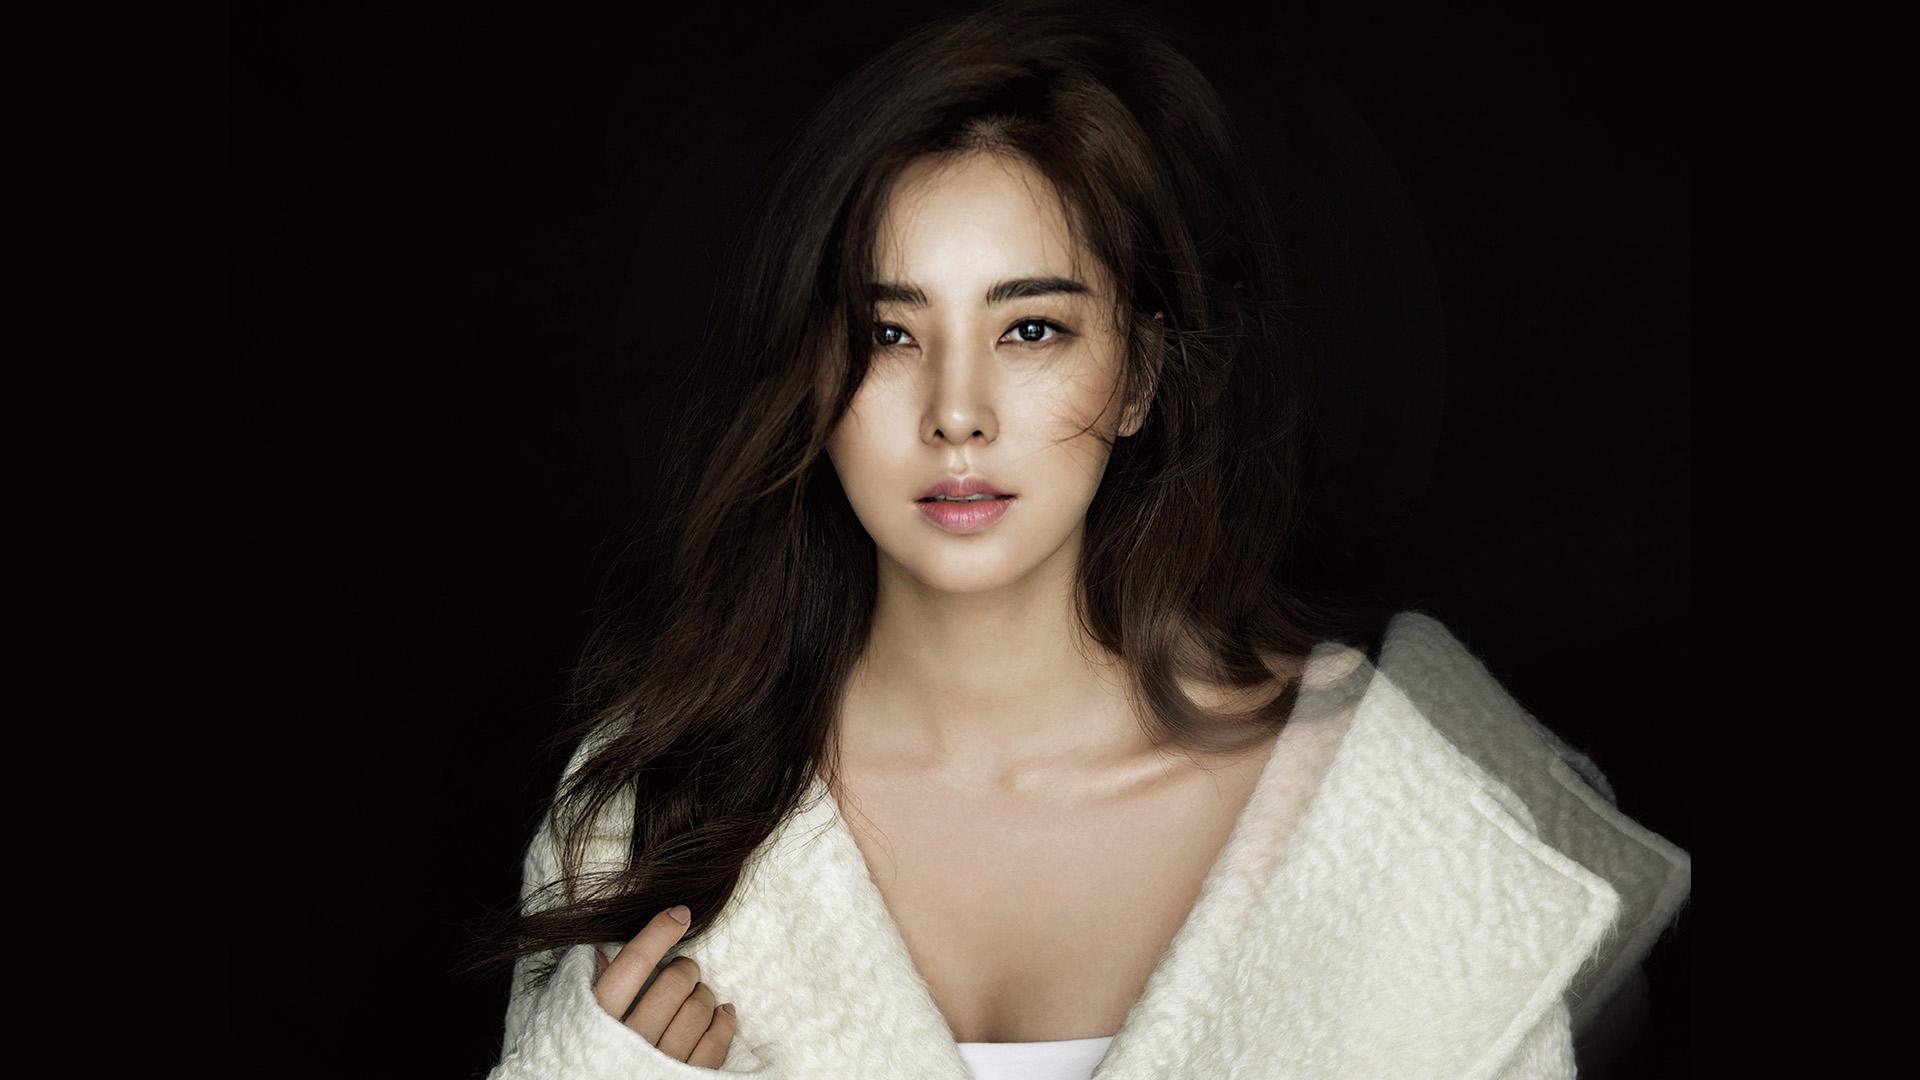 hk69-korean-asian-girl-actress-dark-wallpaper